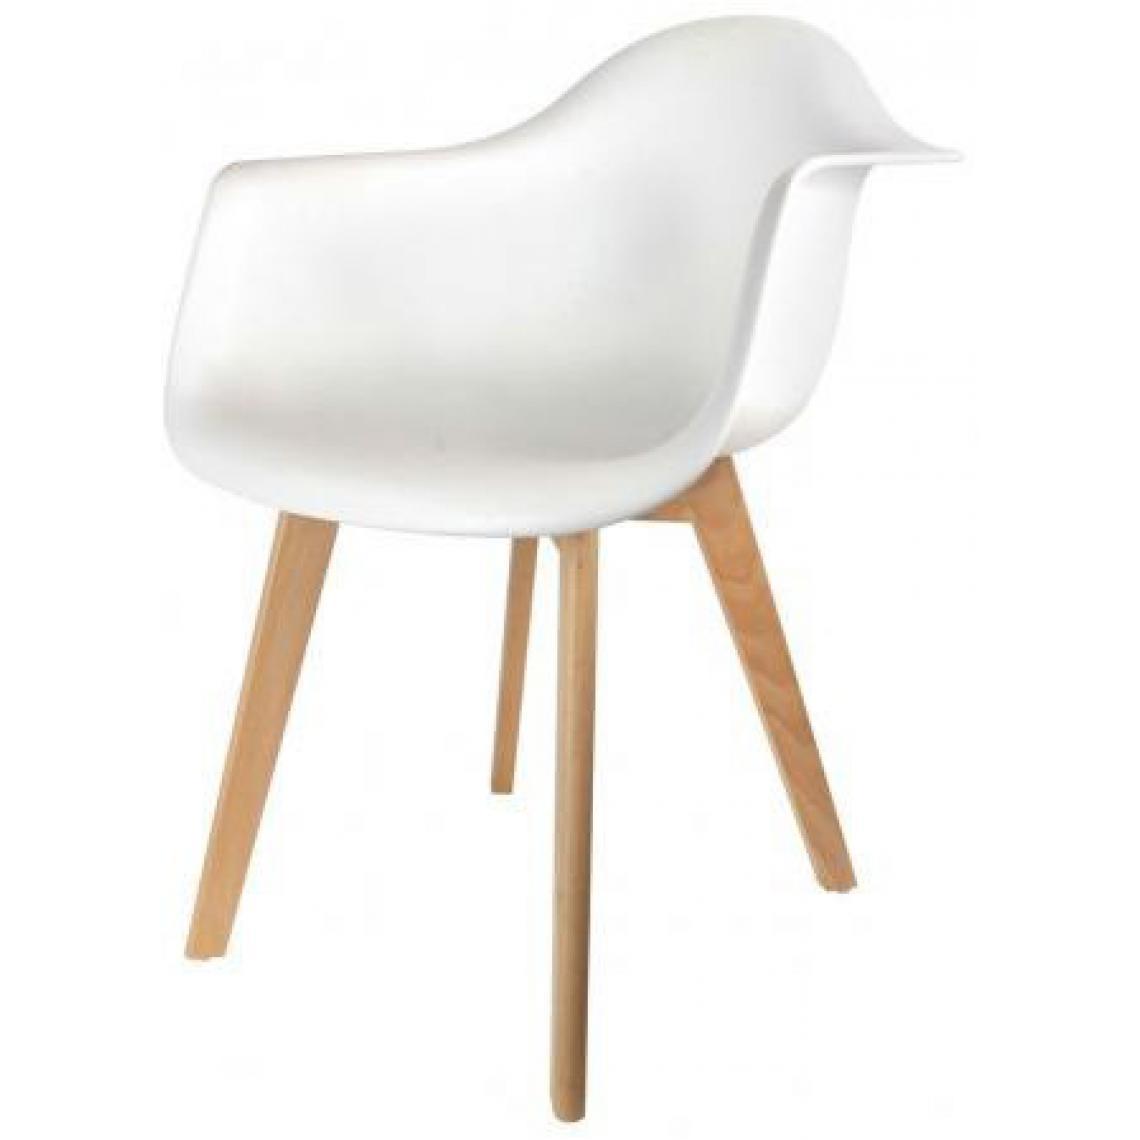 chaise scandinave avec accoudoir blanc fjord